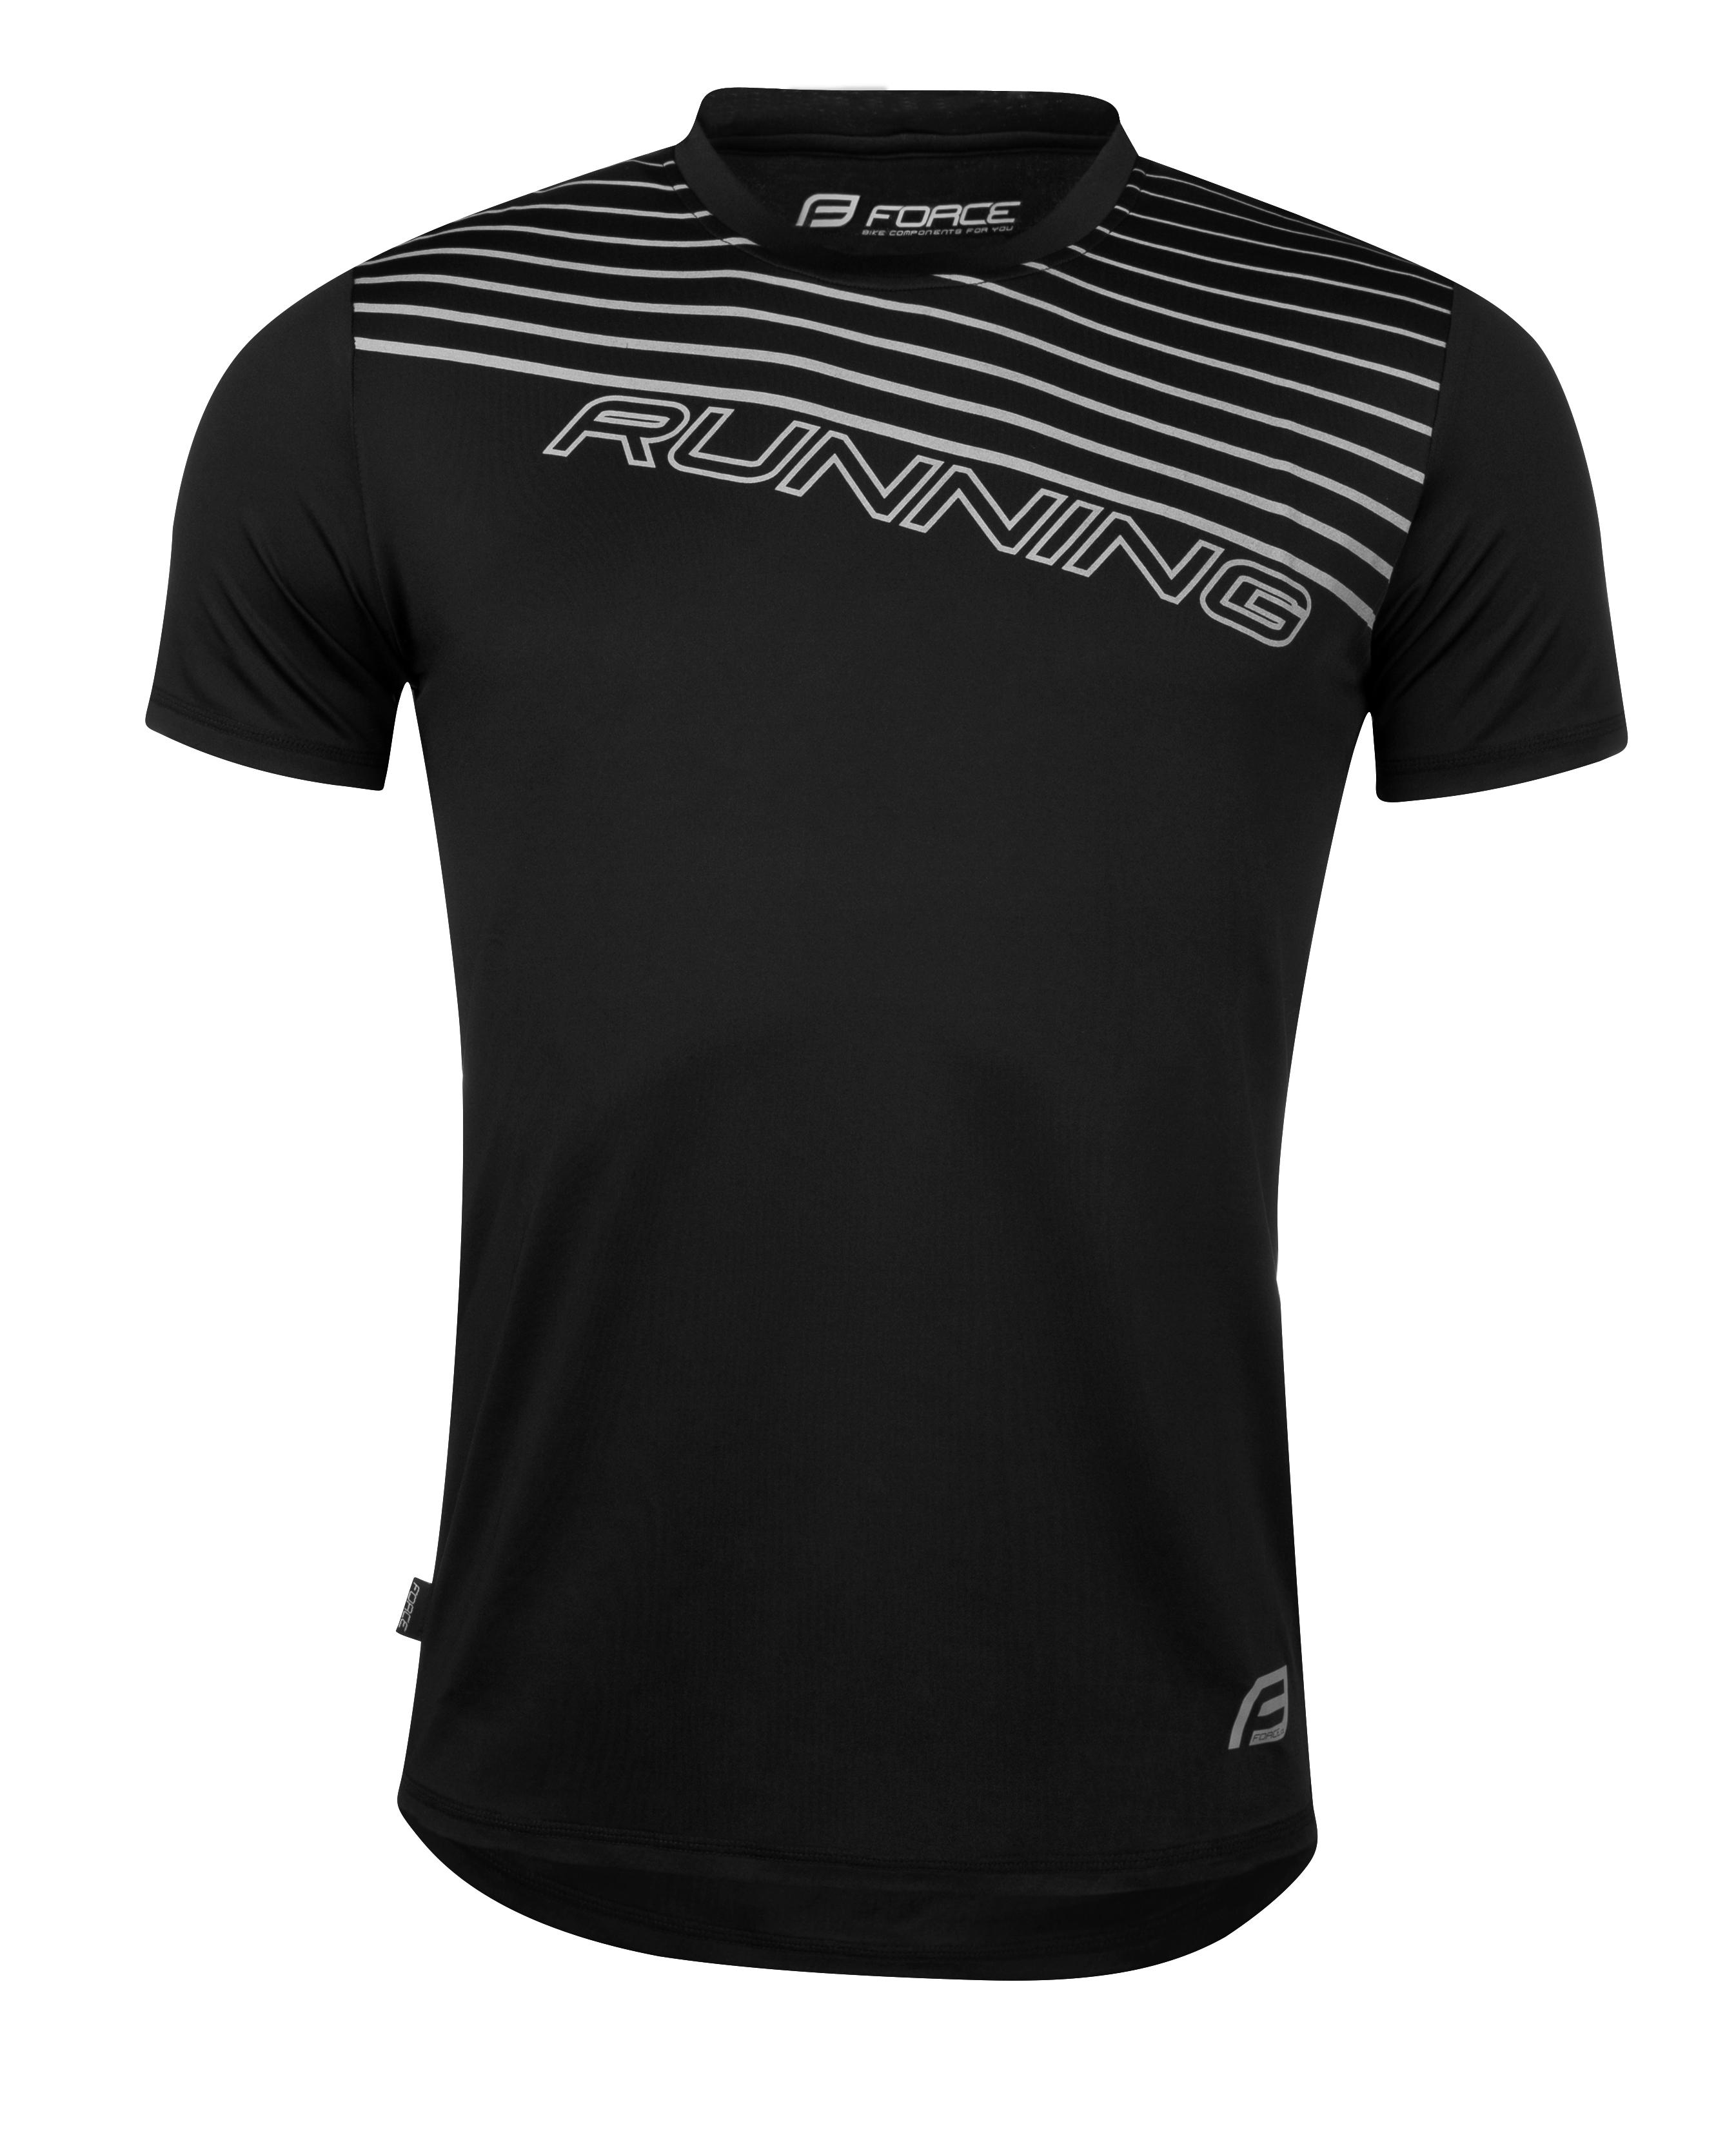 triko běžecké FORCE RUNNING, černé XXL